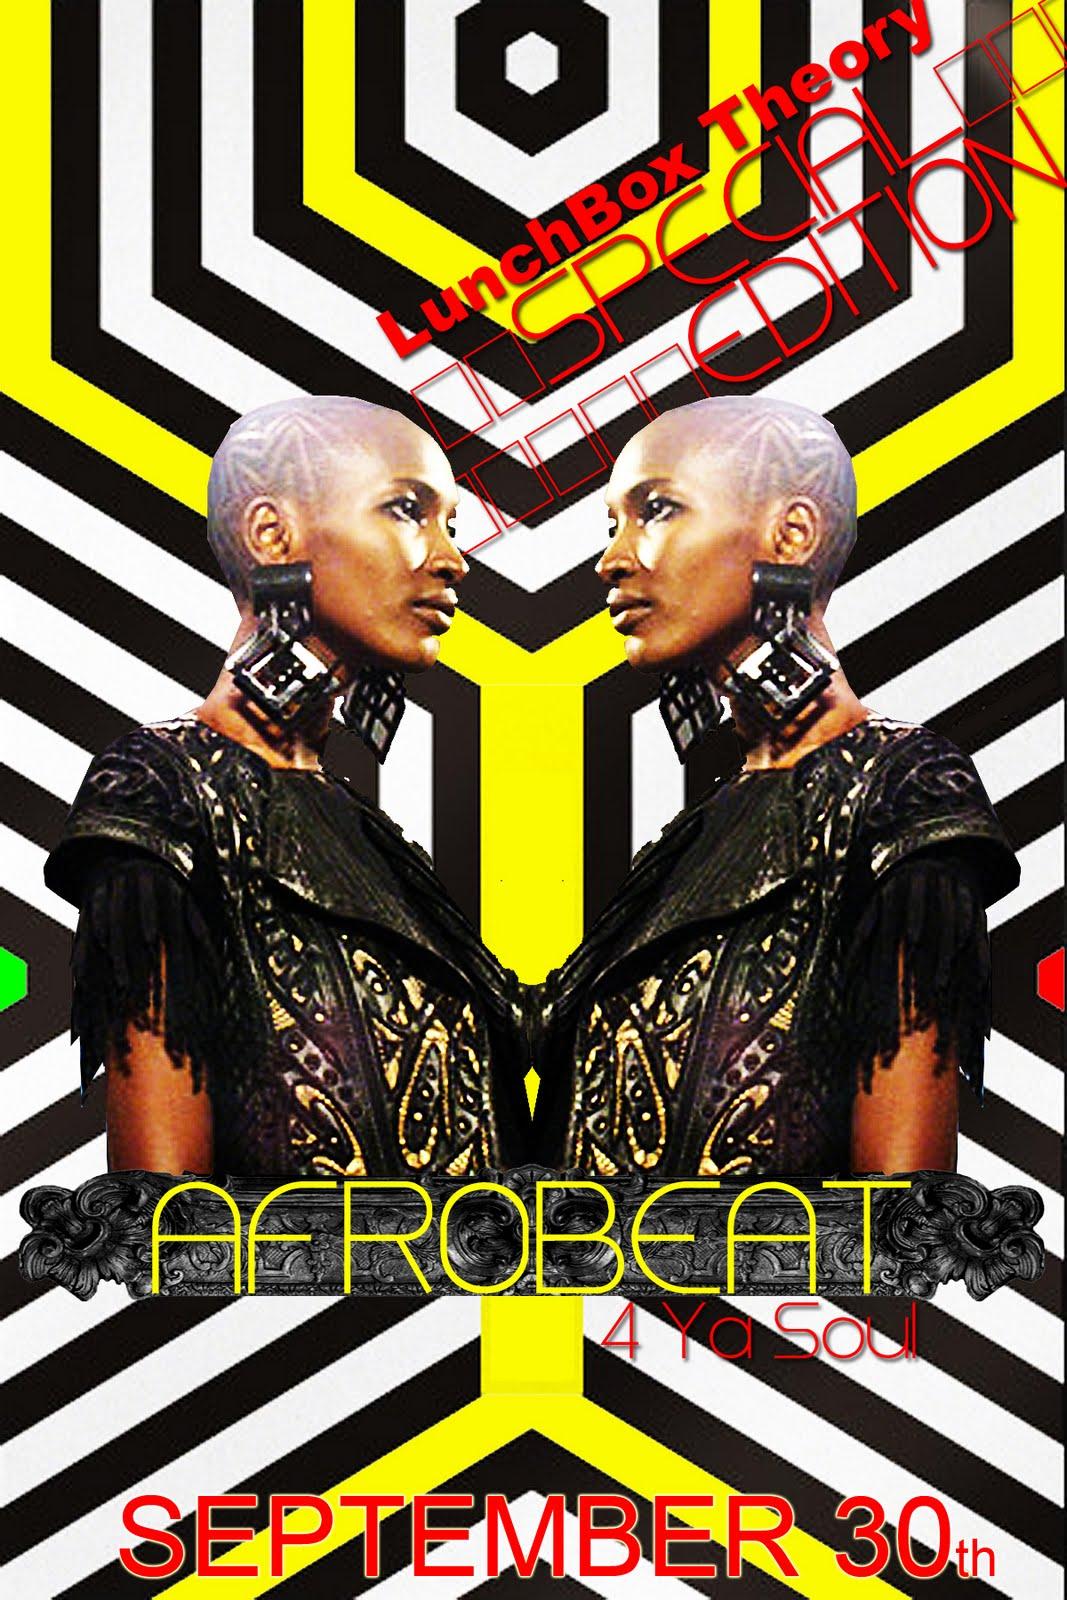 http://4.bp.blogspot.com/_lZ14nLCBlW0/TKKrZ20QnKI/AAAAAAAACR8/SL6gIiU9VaQ/s1600/afrofront.jpg